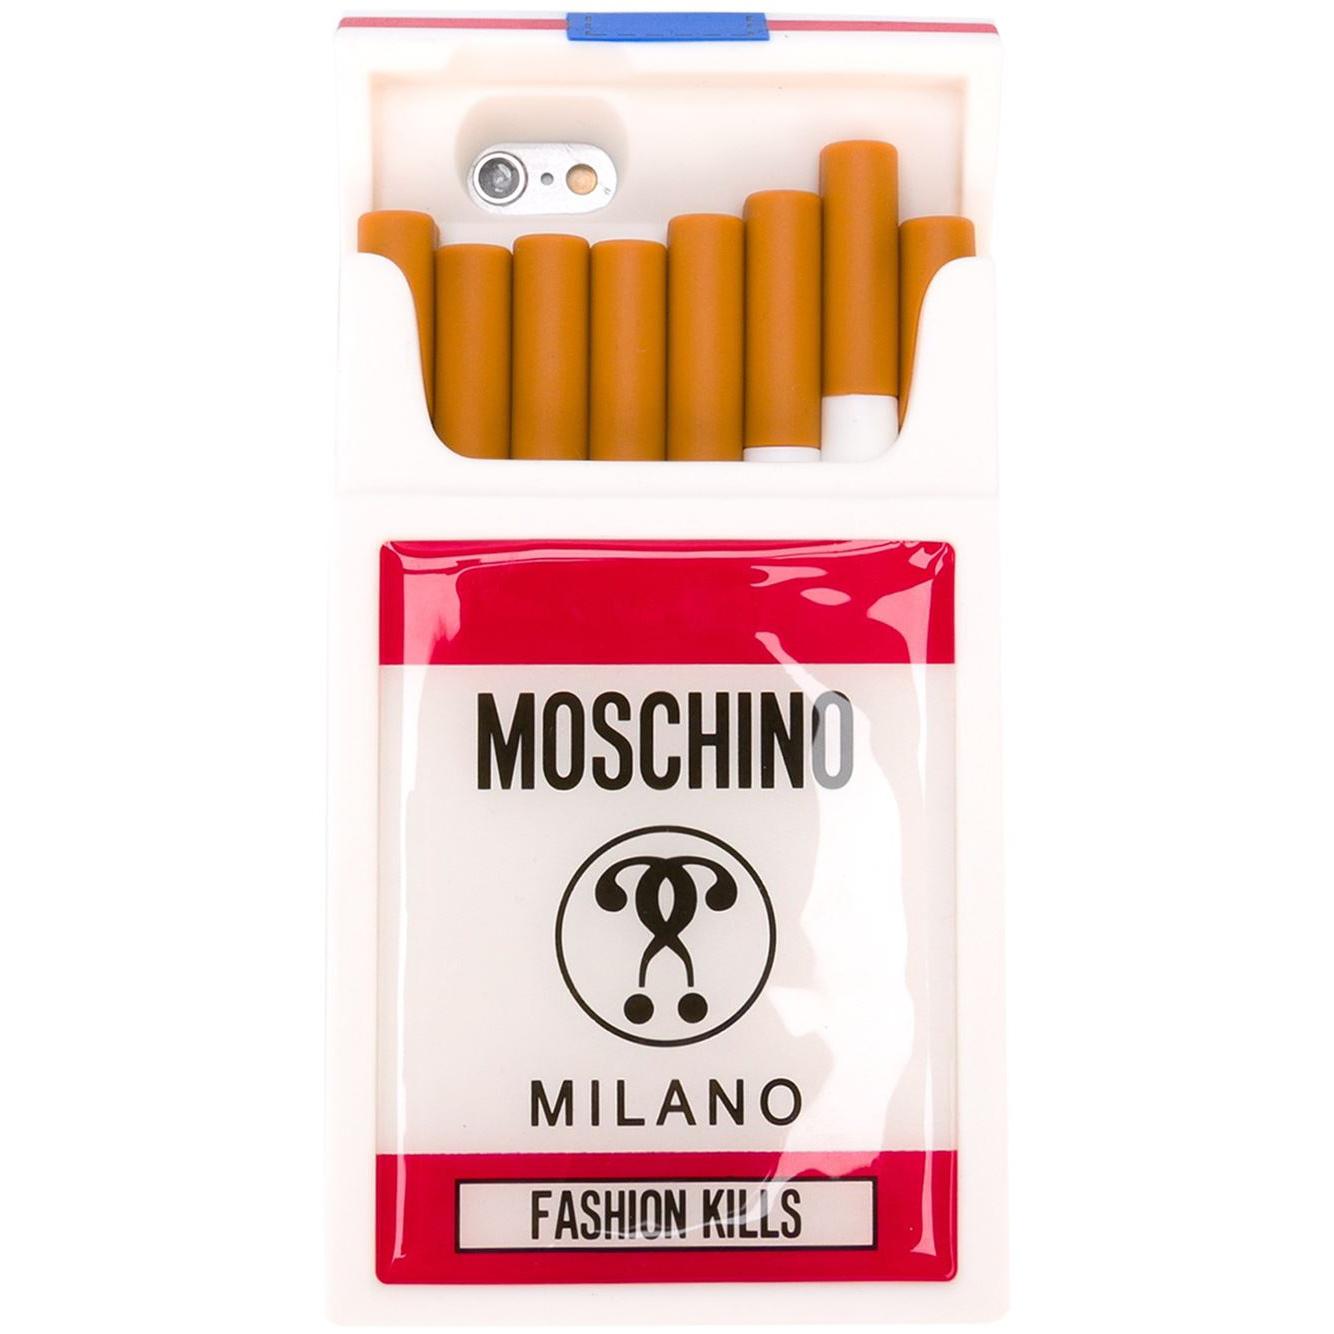 Moschino Fashion Kills iPhone 6 case